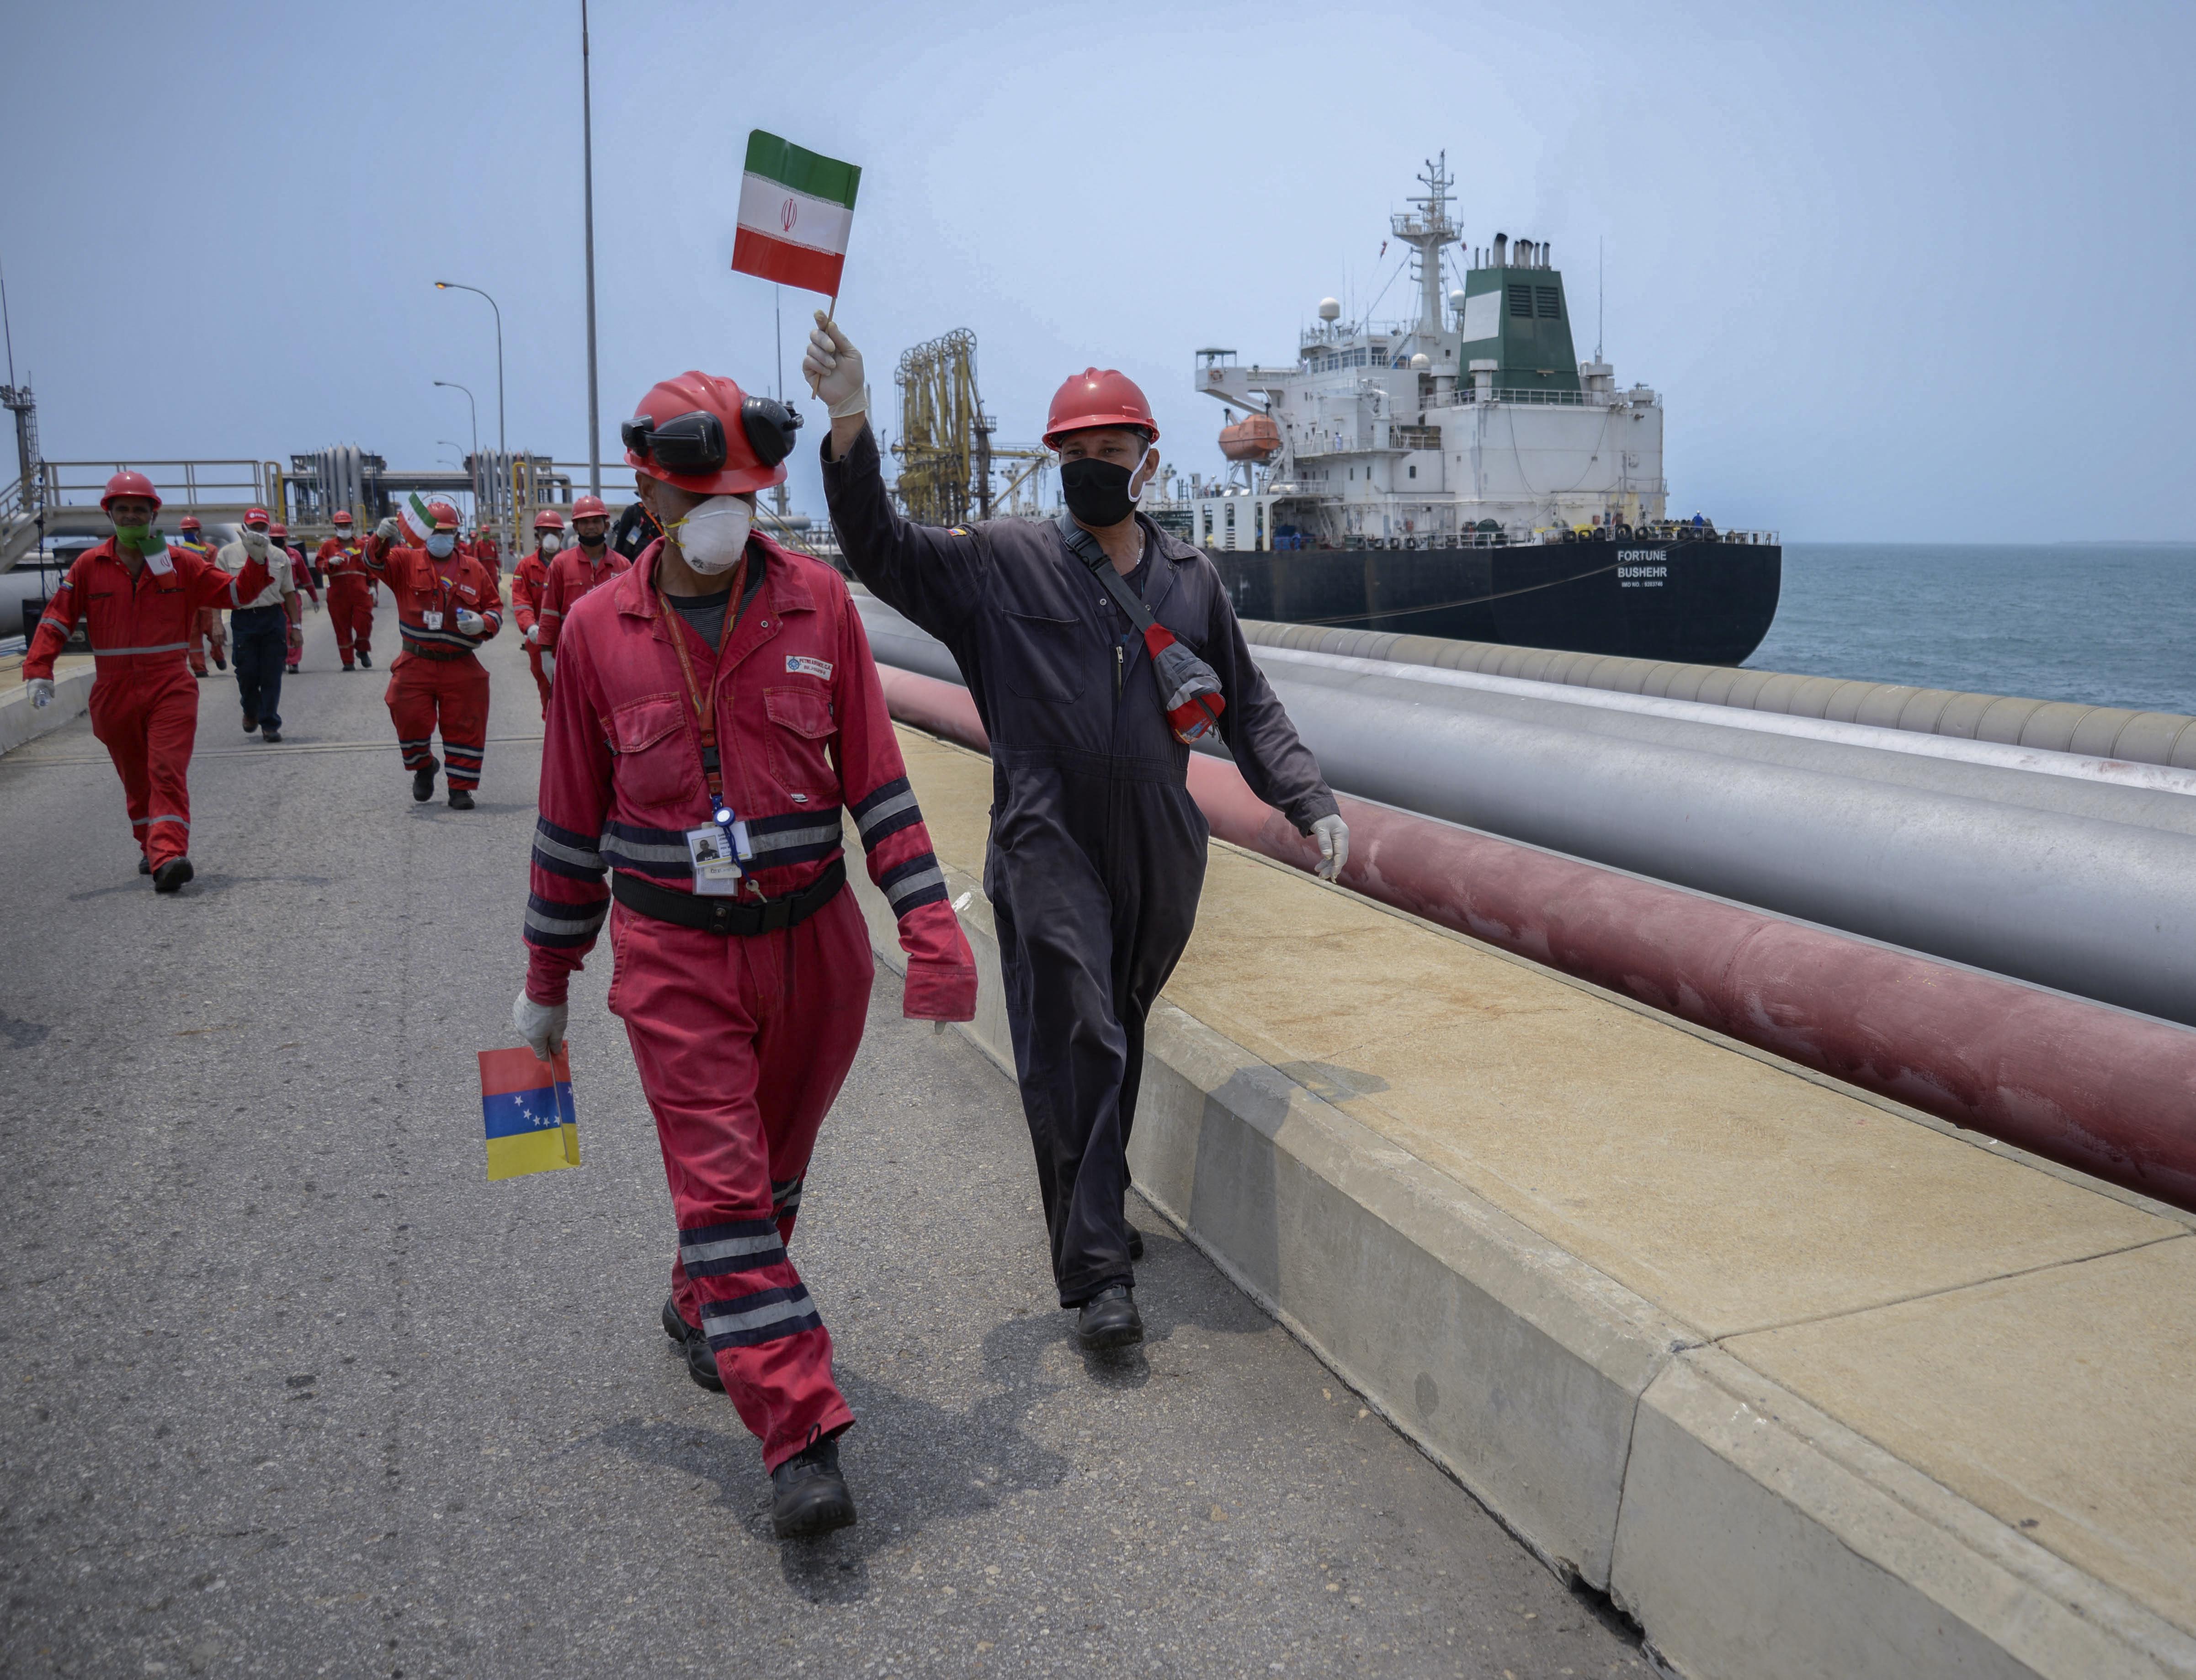 Irã busca aliados na América Latina